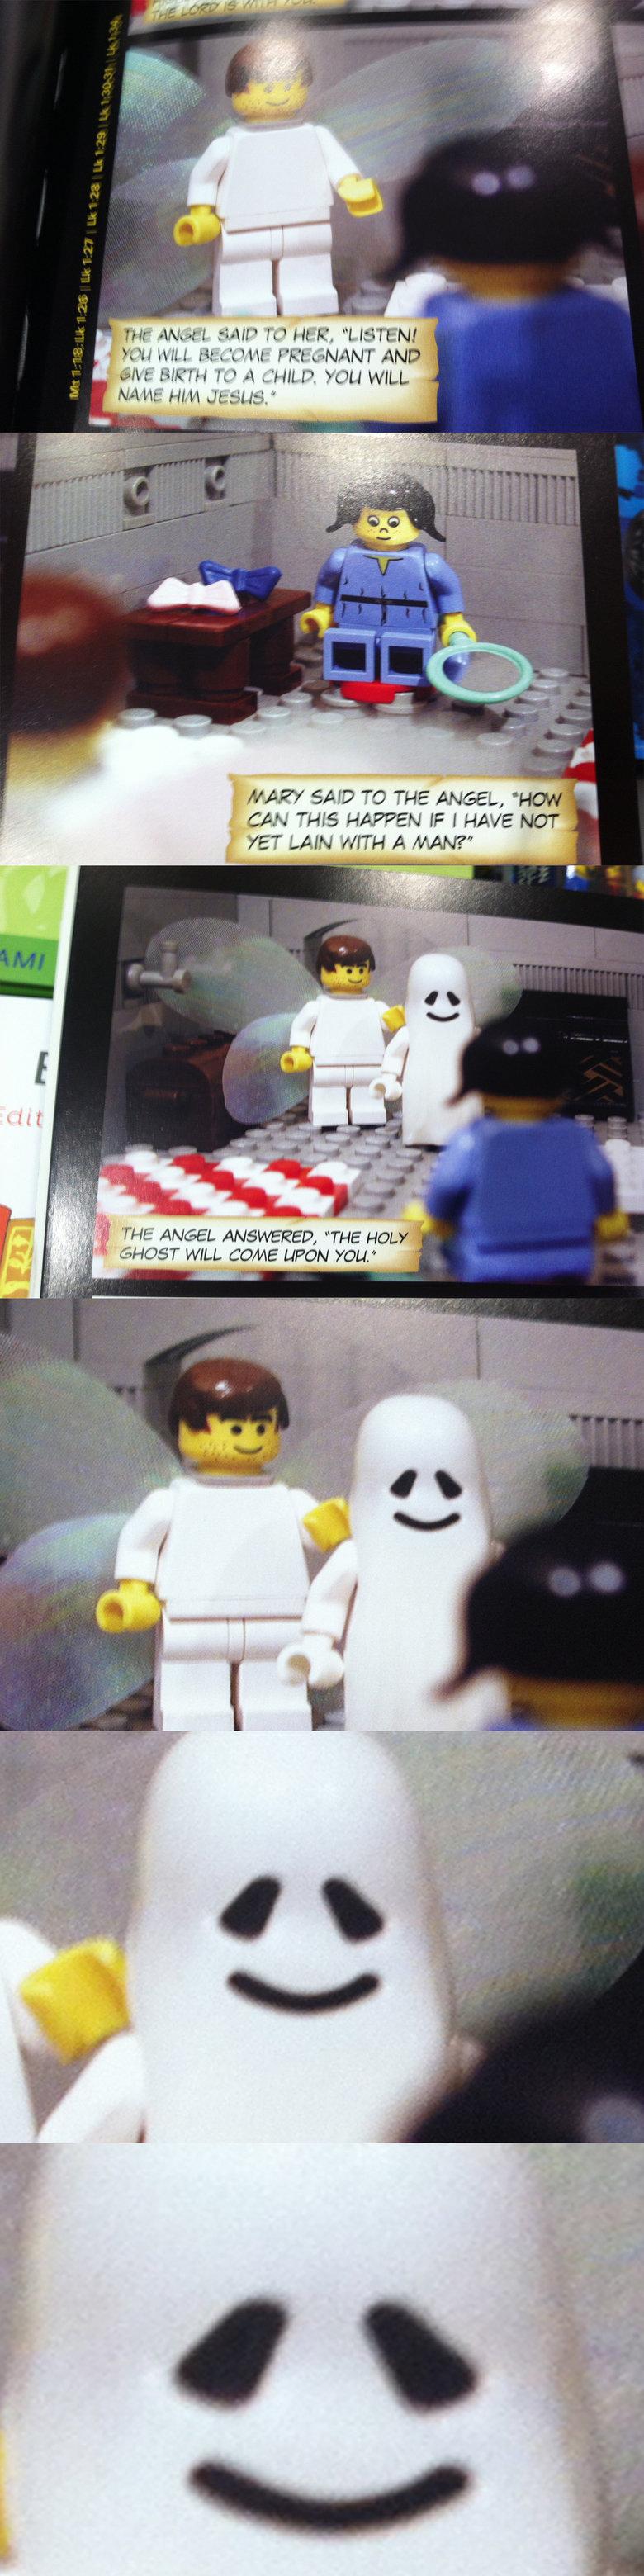 Lego wat r u doin lego stap. oc.. u want sum fuk? Lego wat r u doin lego stap oc want sum fuk?